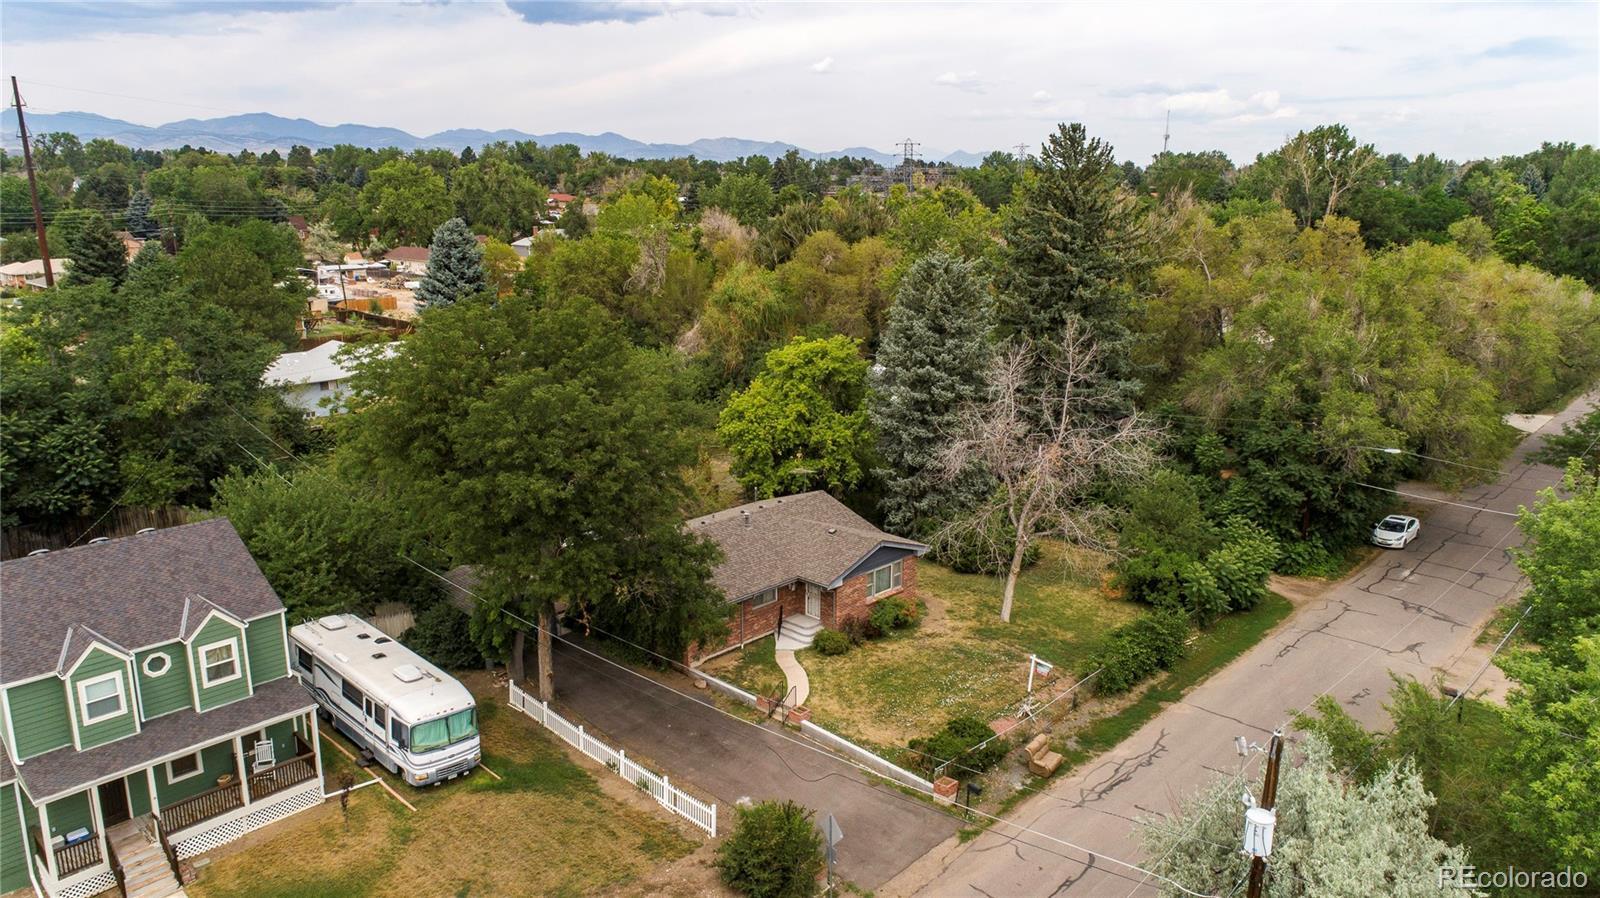 MLS# 8960672 - 38 - 1749 Hoyt Street, Lakewood, CO 80215